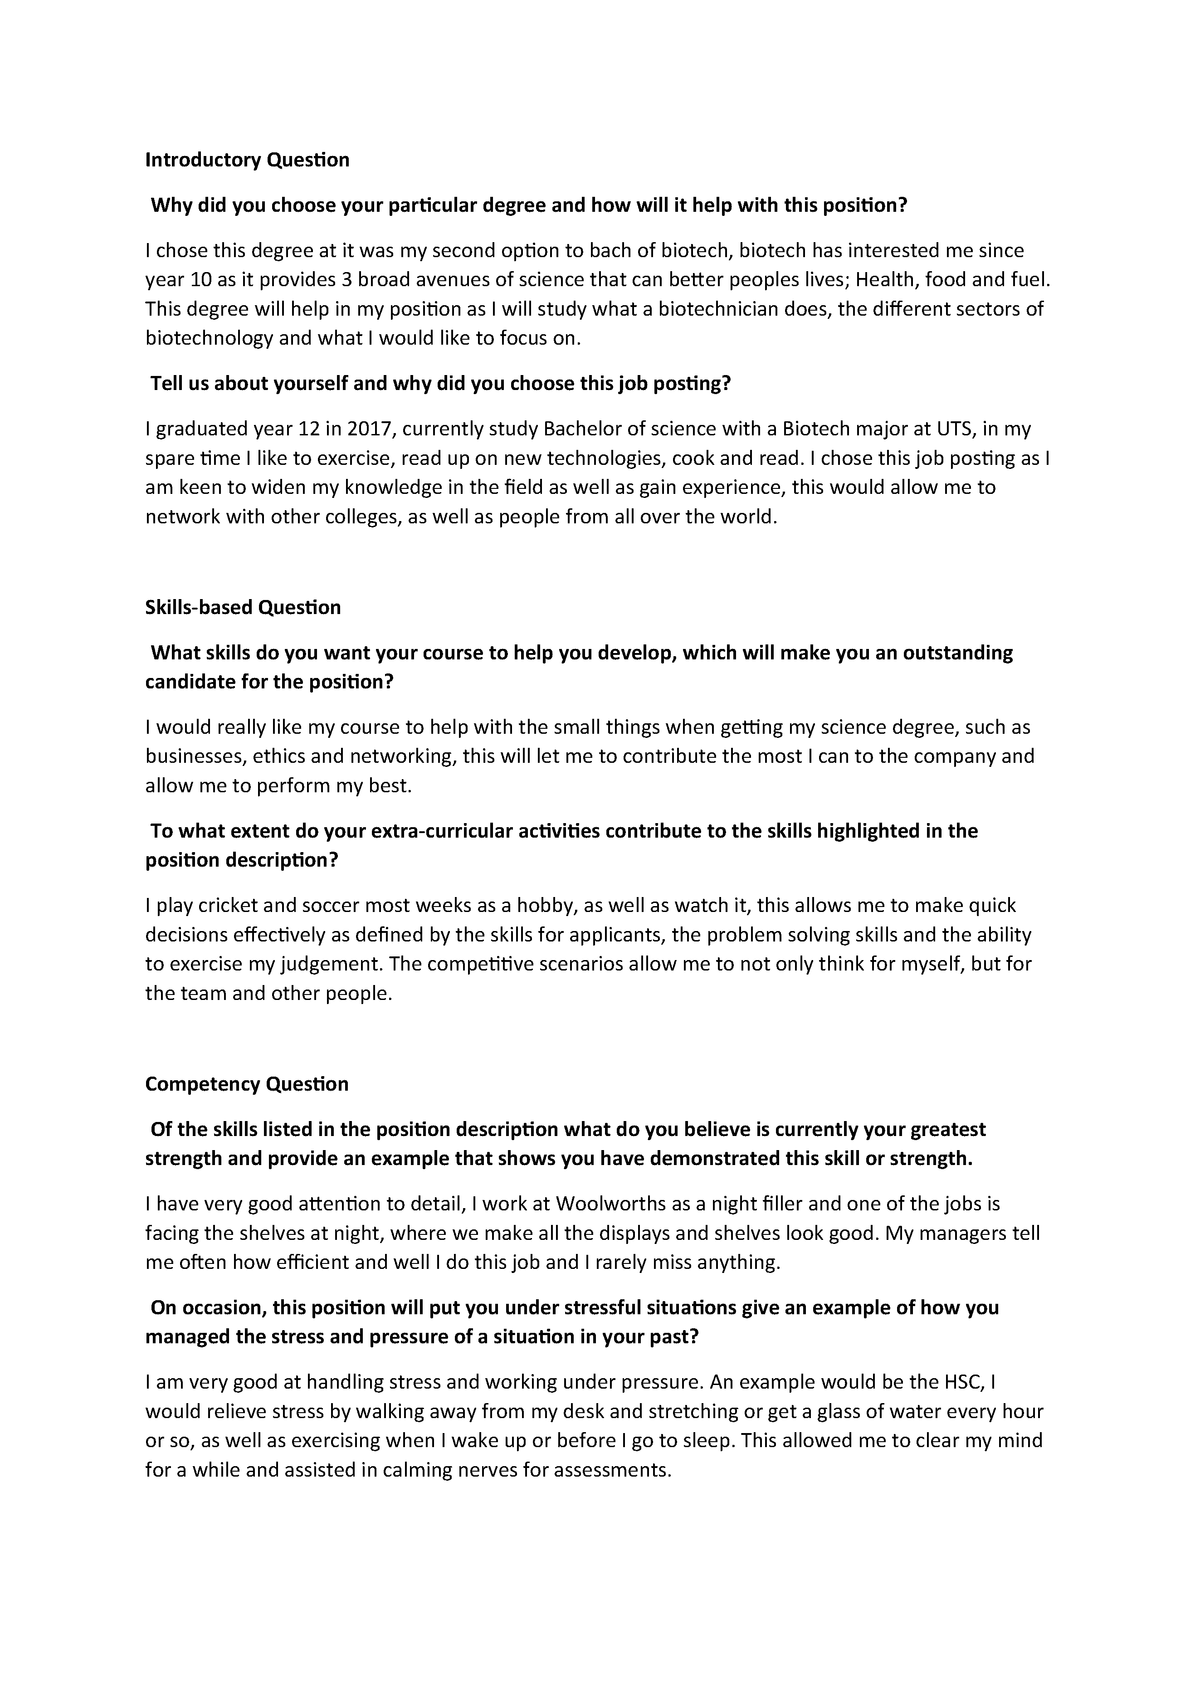 PSP interview - 60001 Principles of Scientific Practice